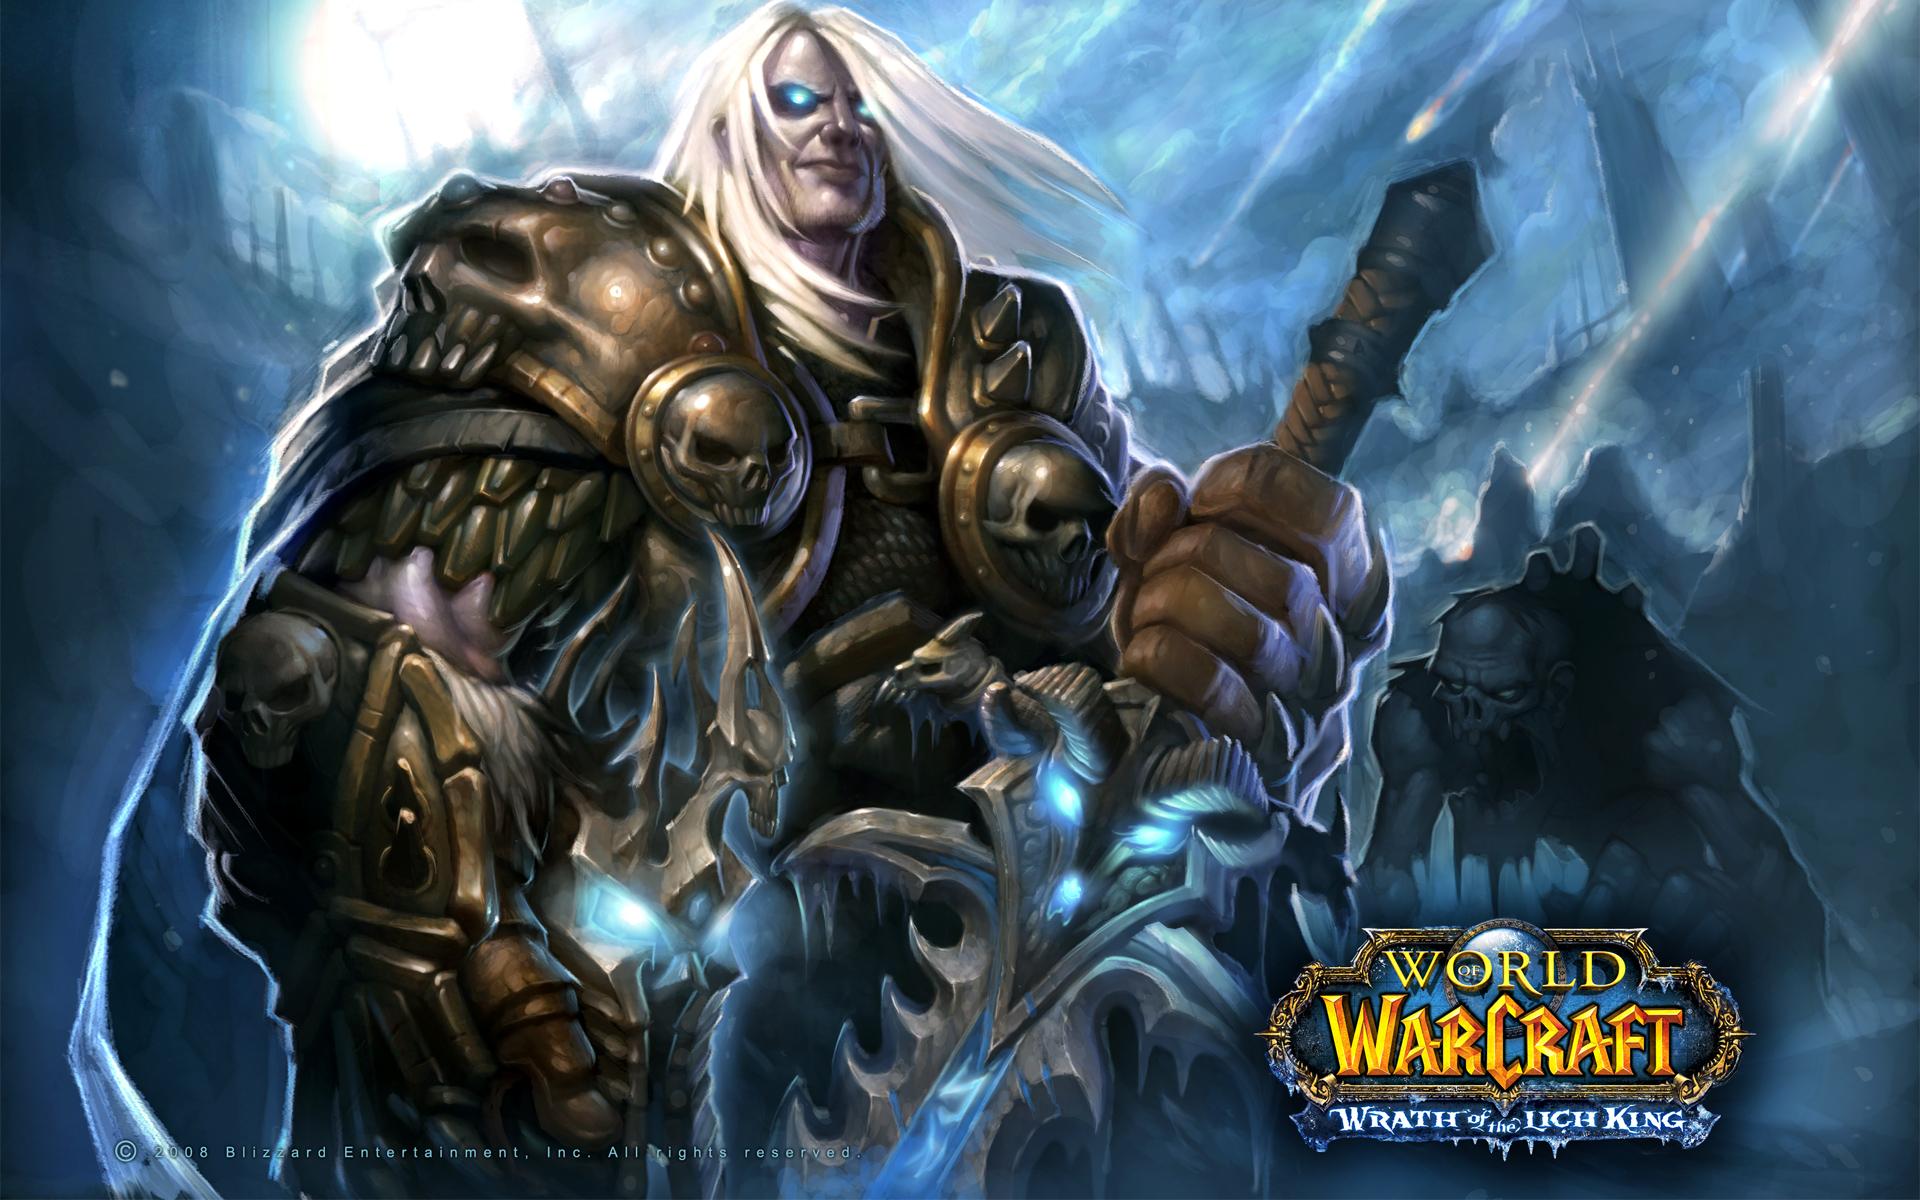 world of warcraft 1680x1050 wallpaper 64343